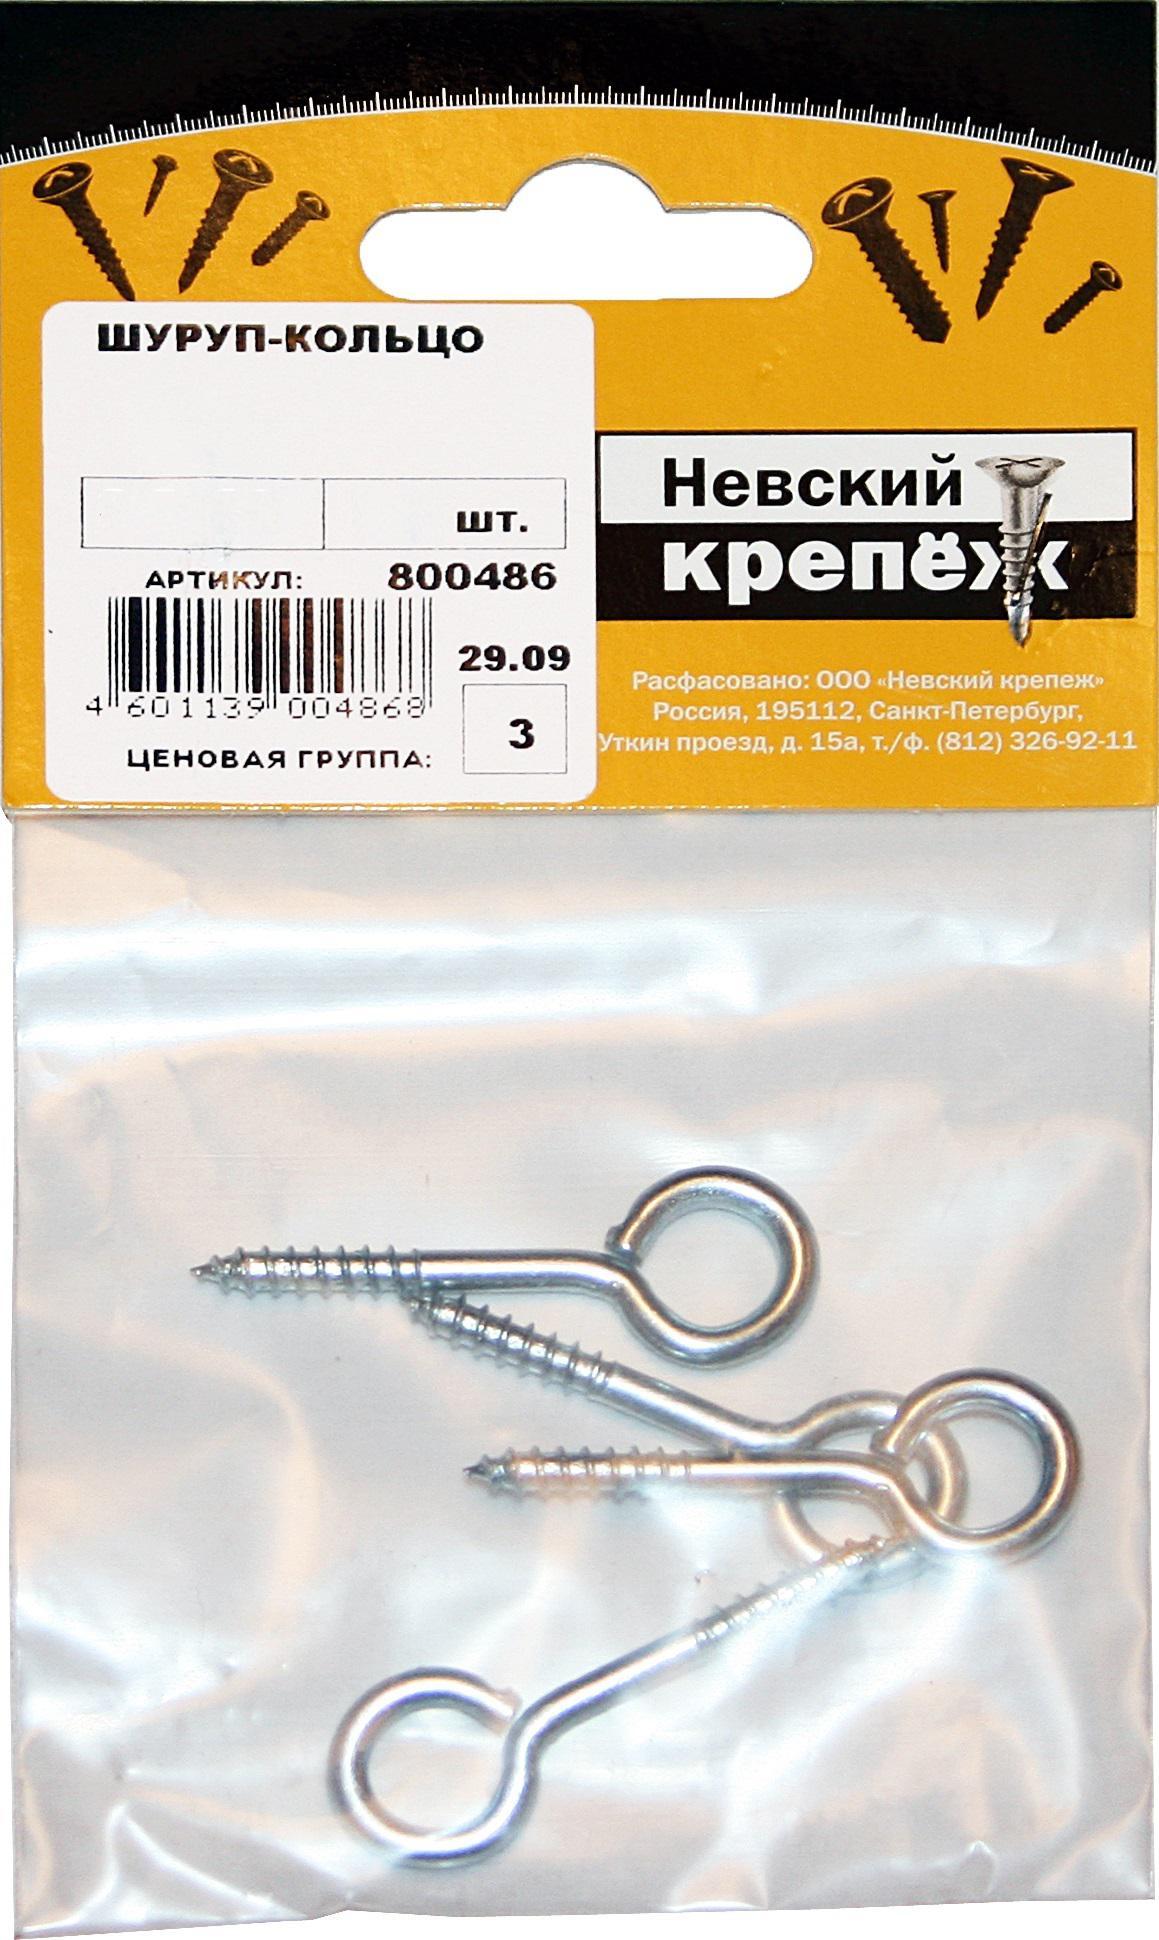 Шуруп-кольцо НЕВСКИЙ КРЕПЕЖ 800489